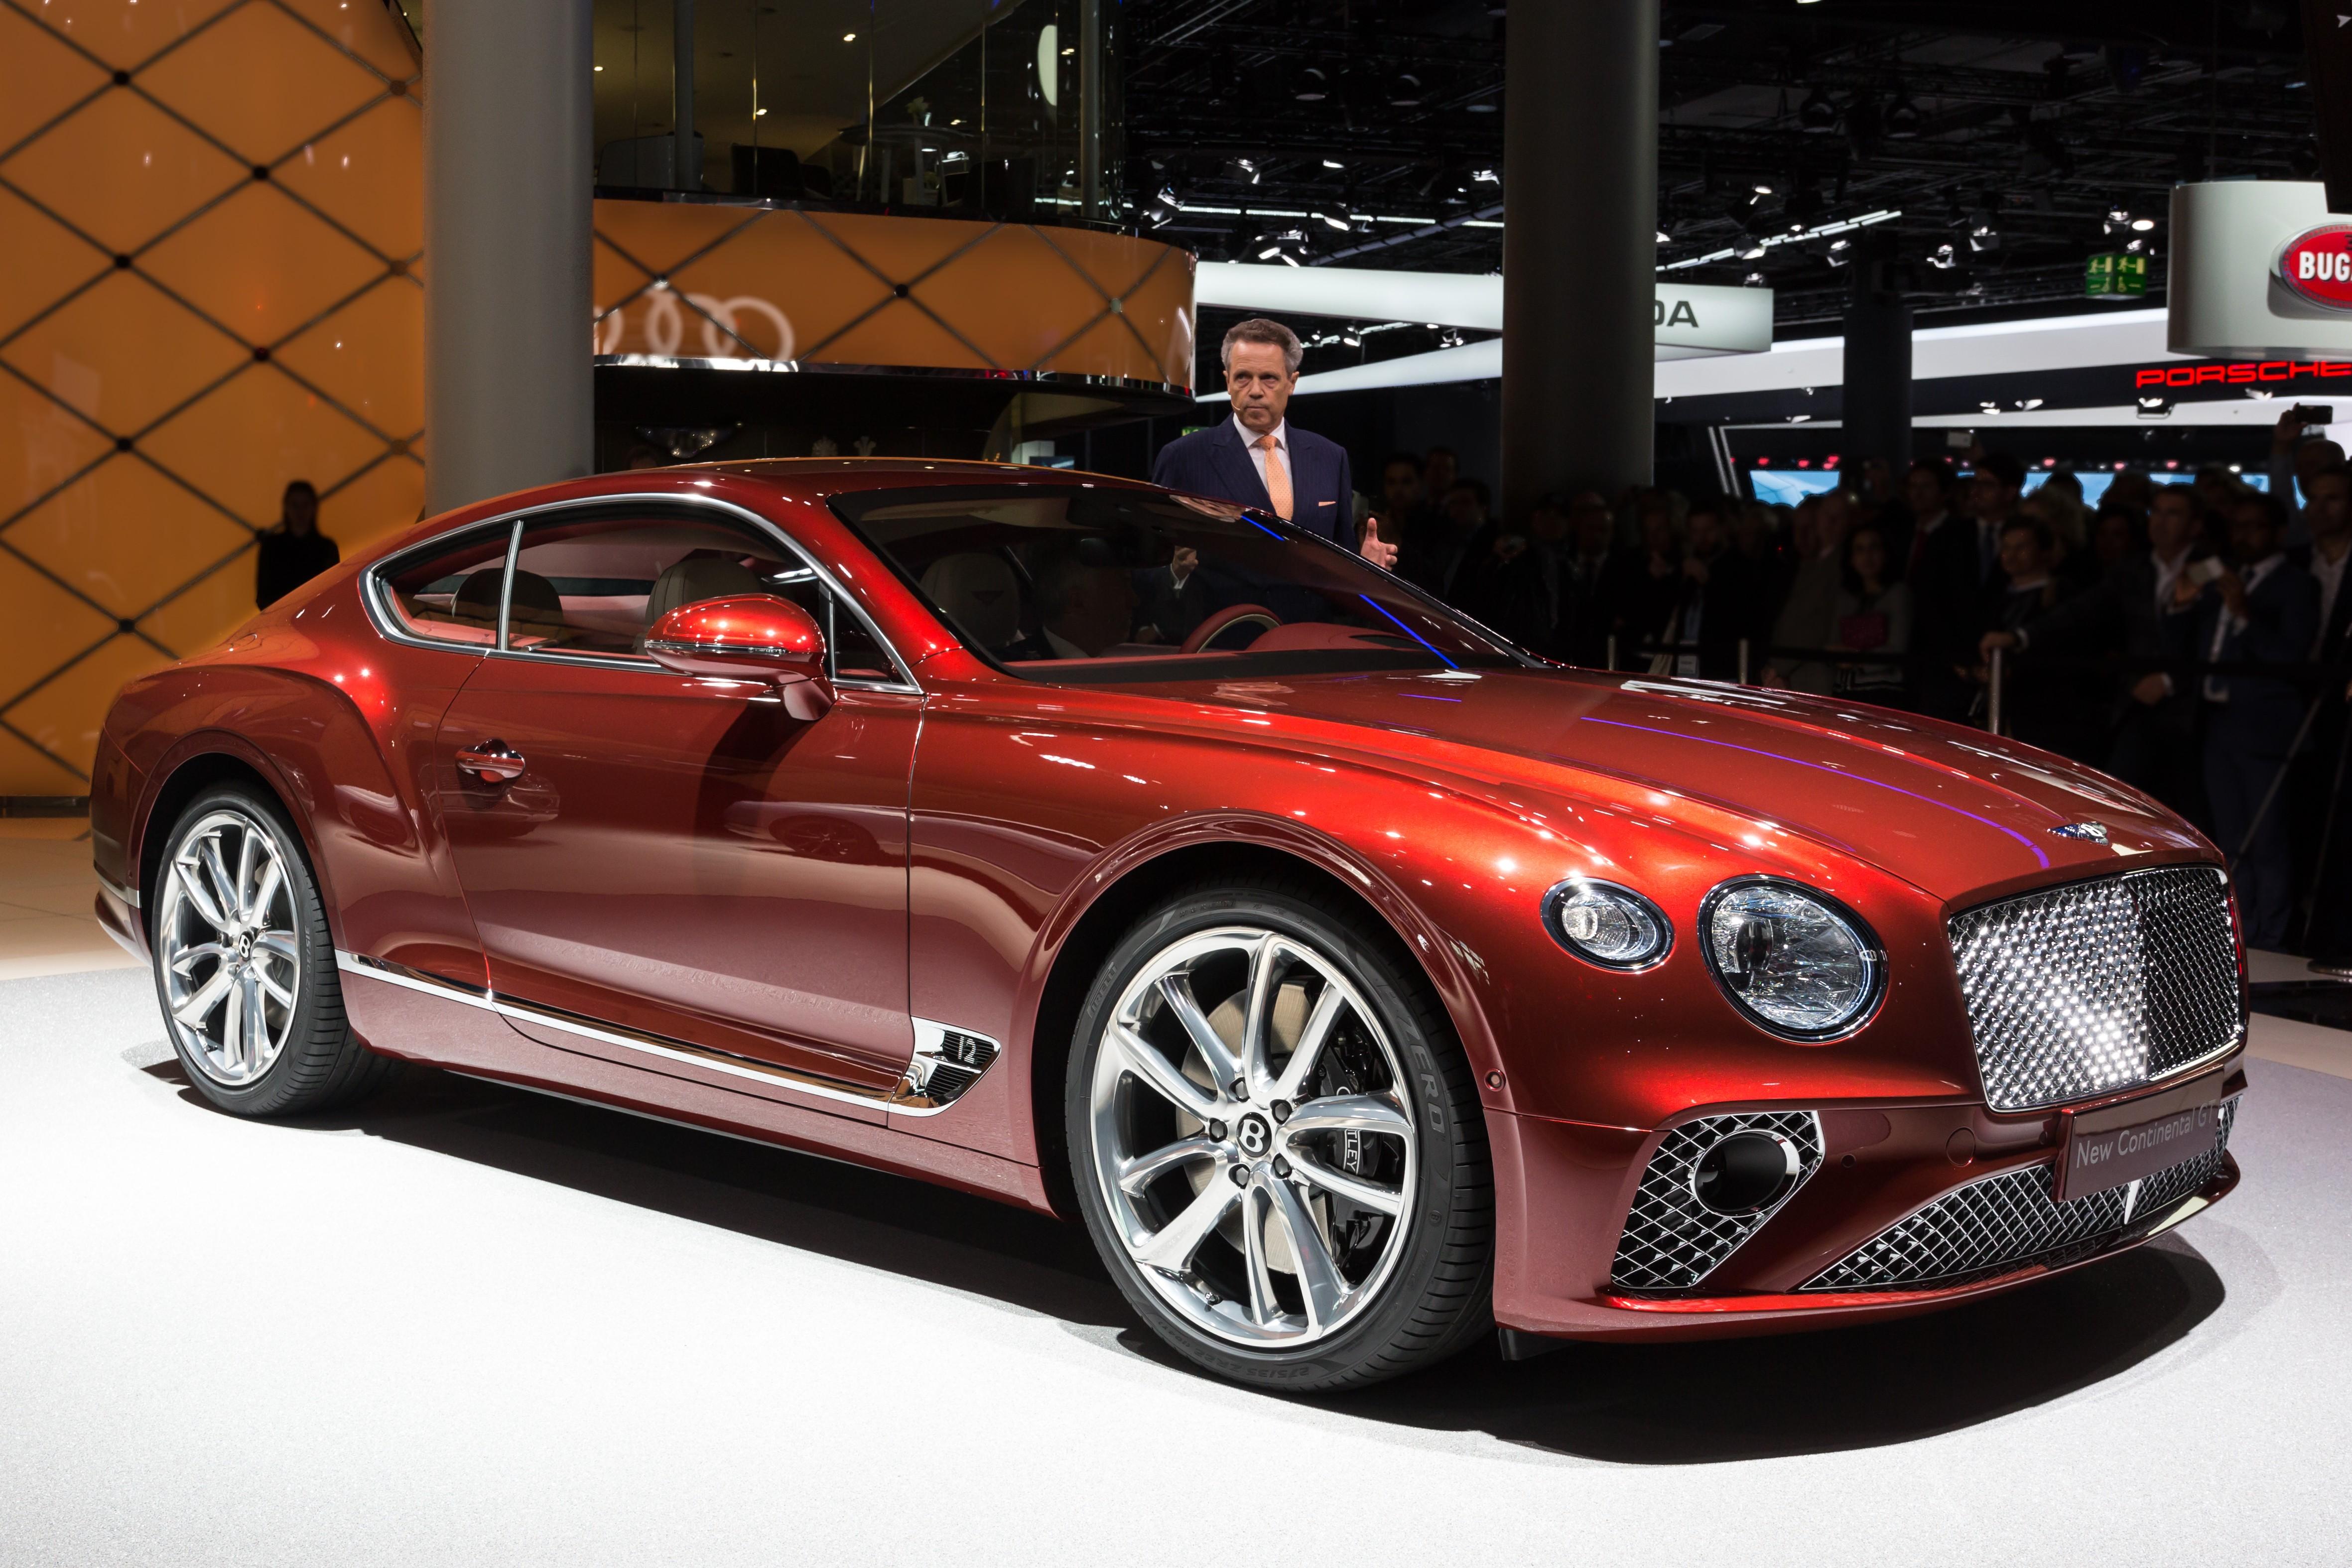 Bentley W12 Engine Diagram Borg Warner Overdrive Wiring Continental Gt Of